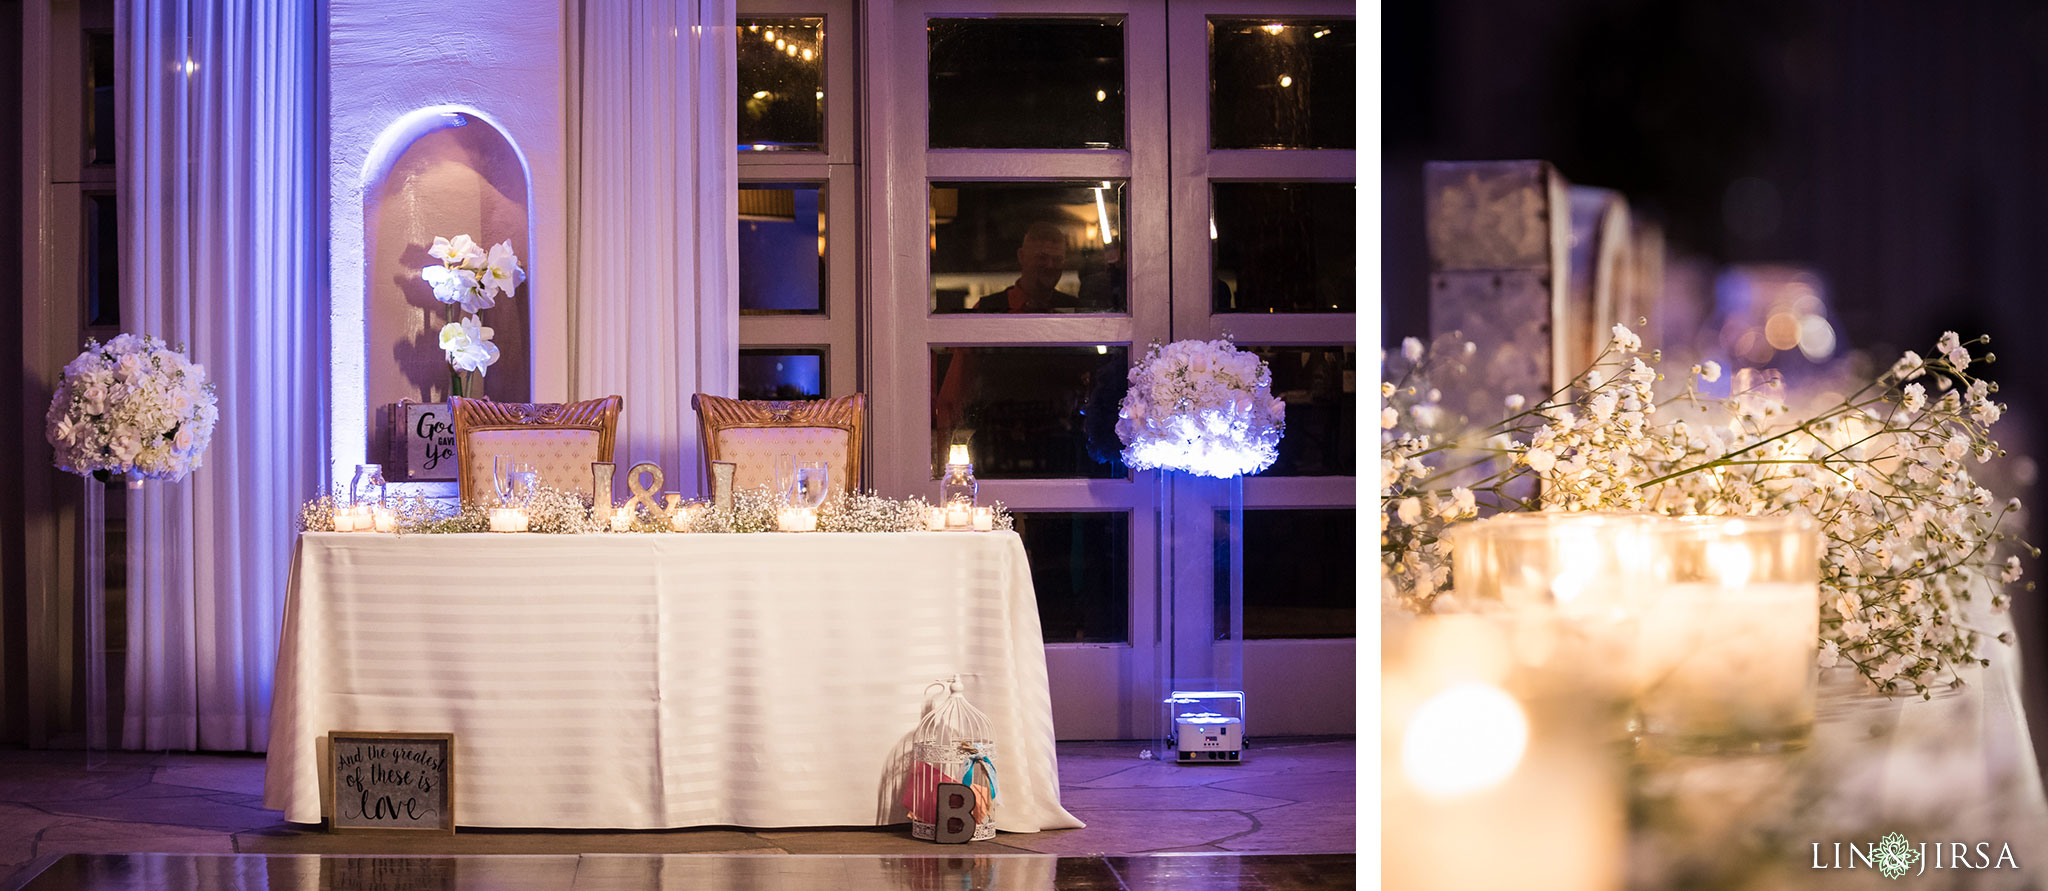 30 turnip rose promenade orange county wedding reception photography